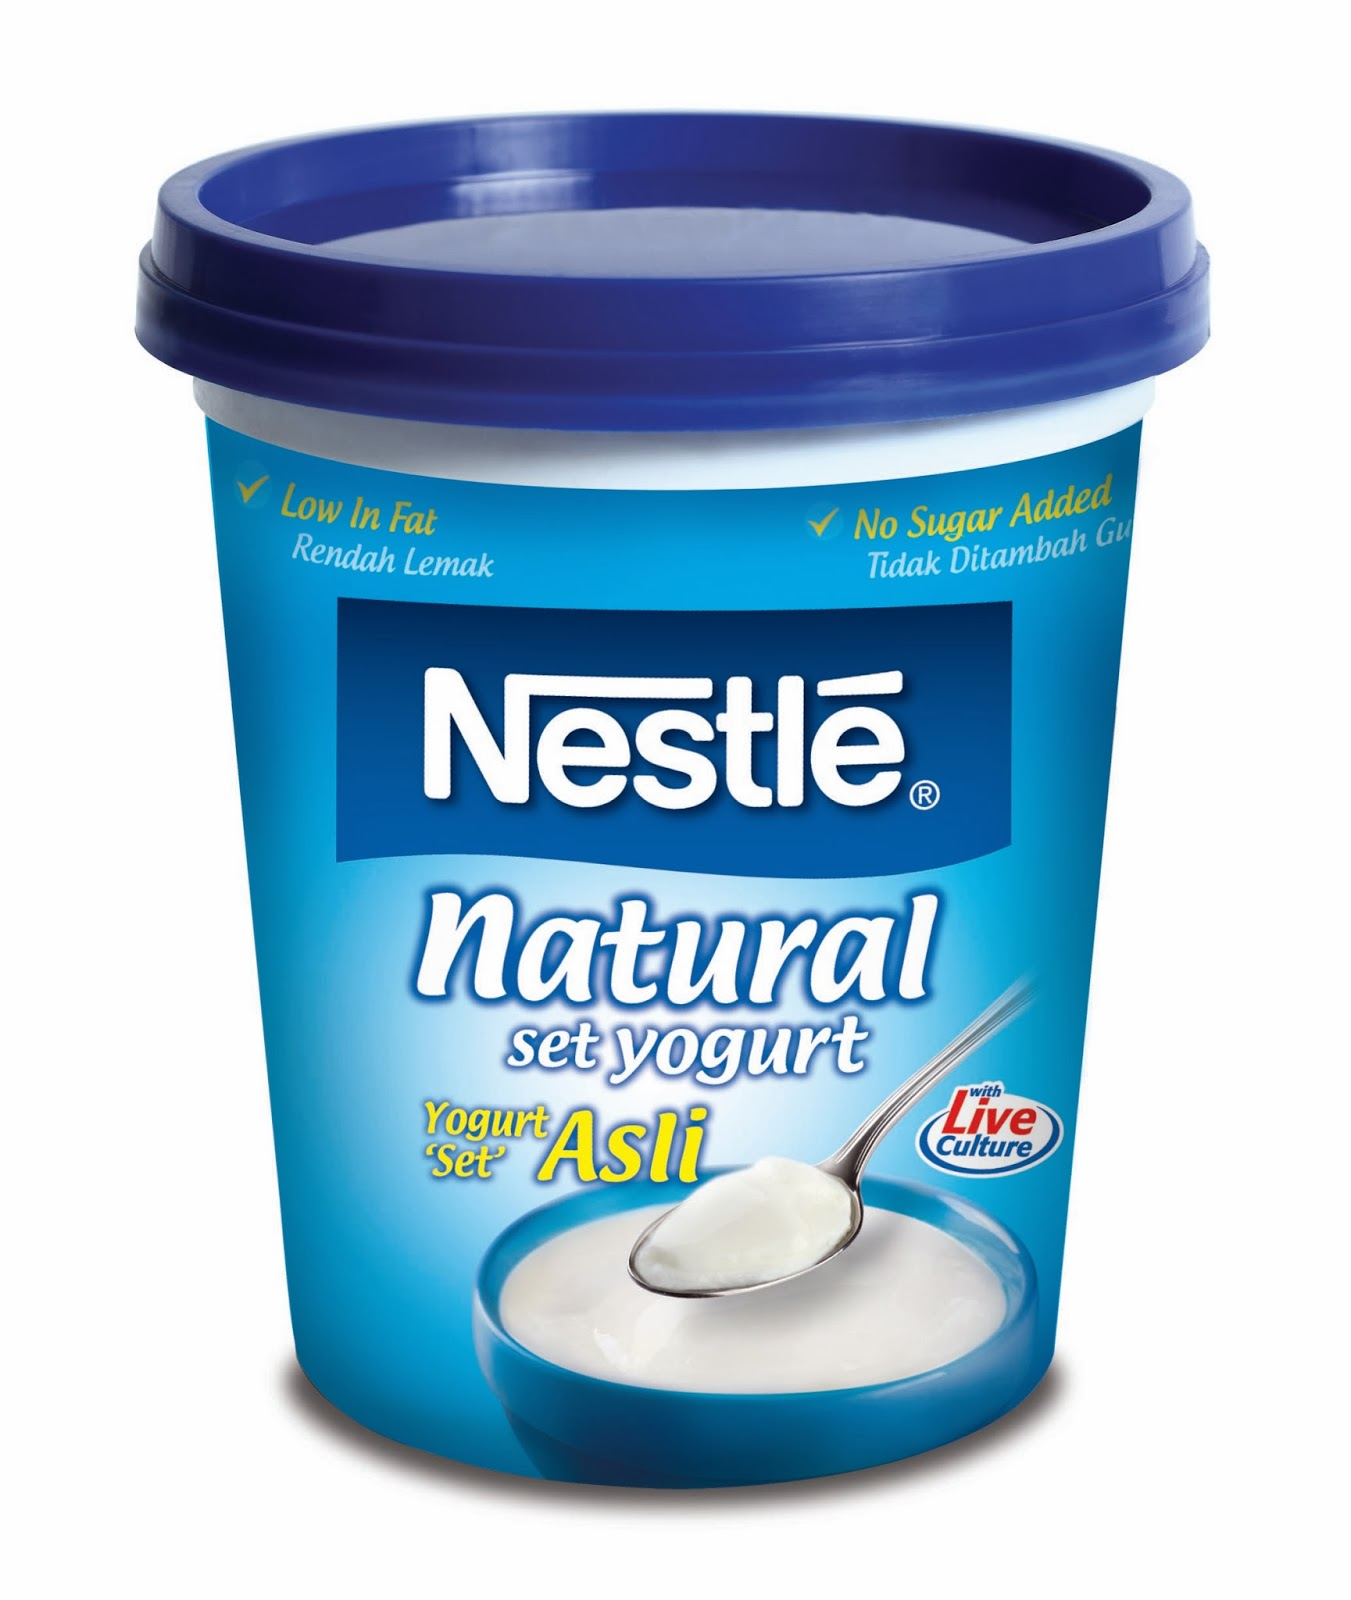 iT's My LiFe...: NESTLE Natural Set Yogurt Recipe ...